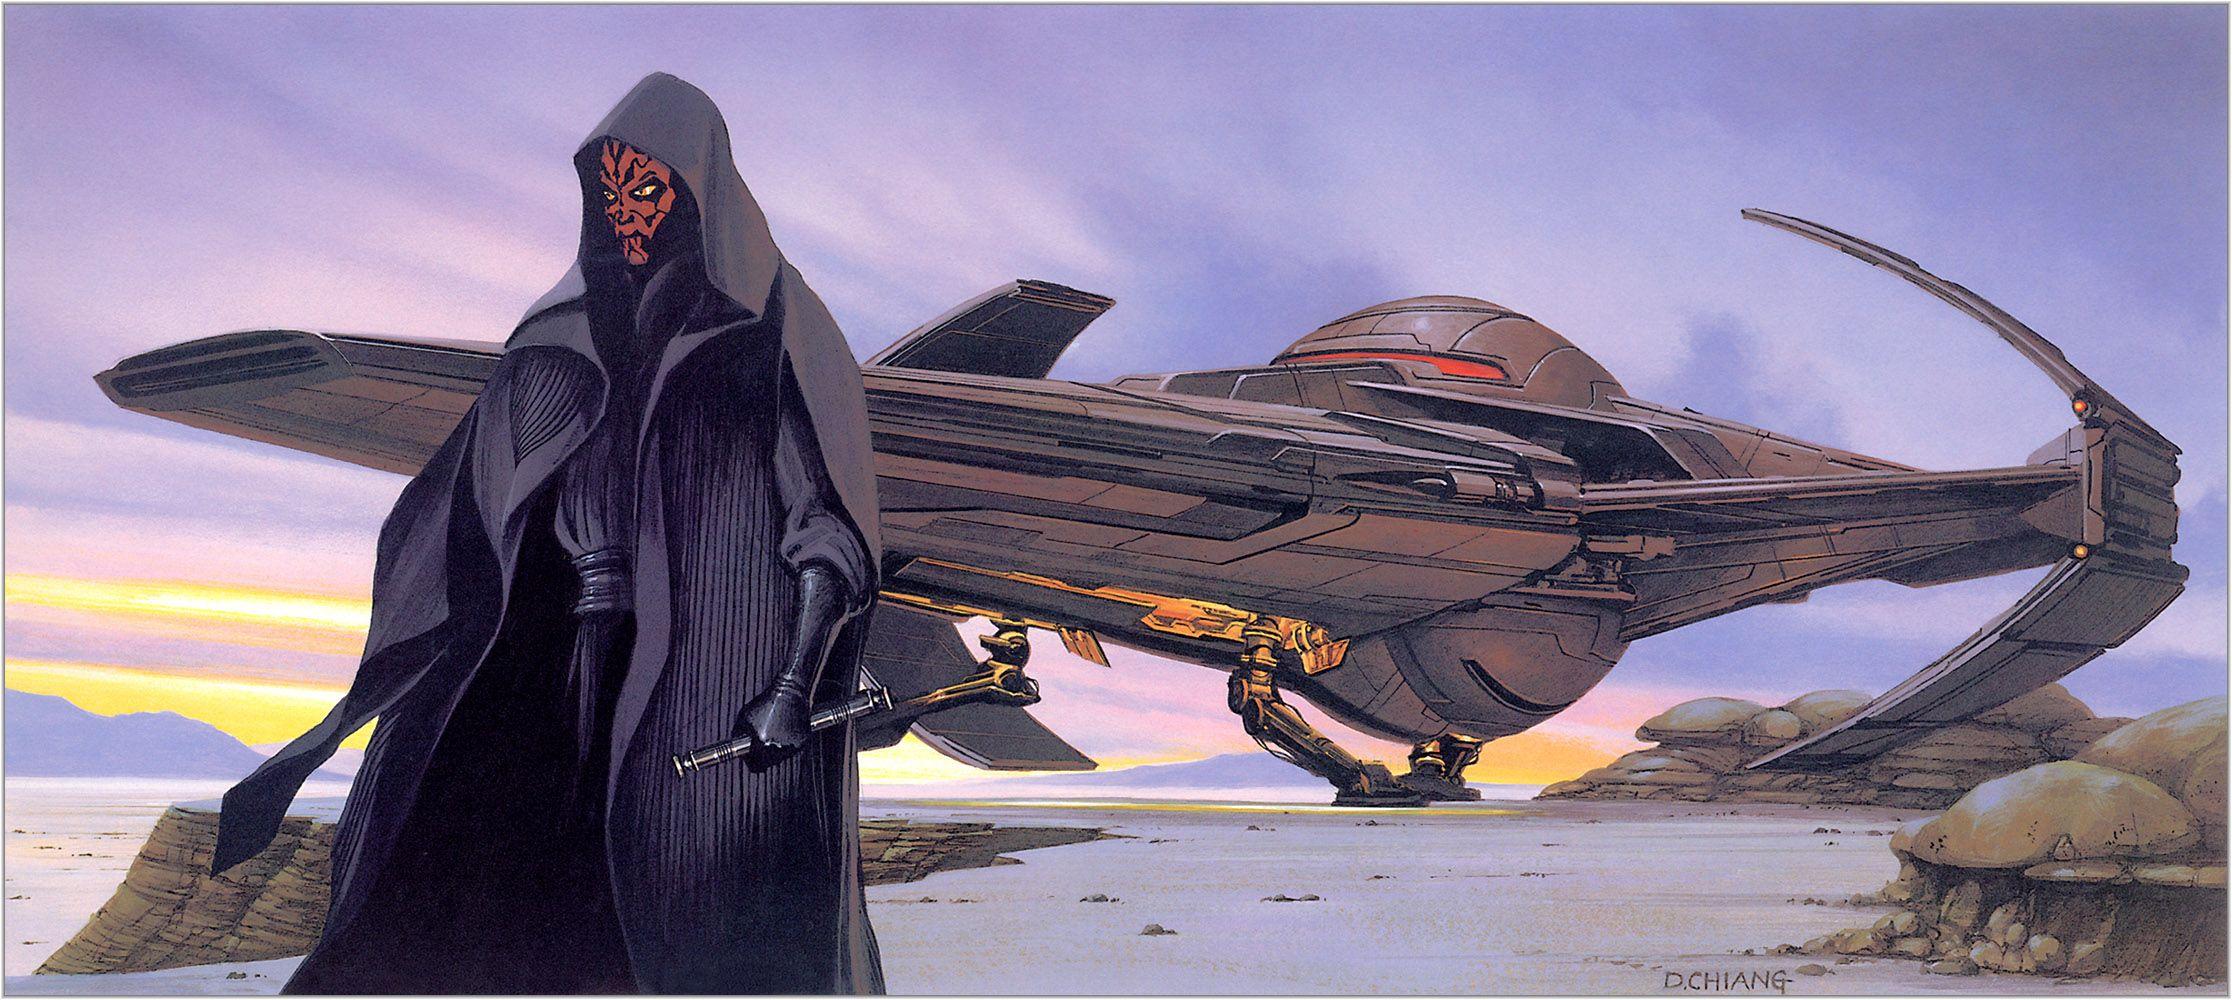 Doug Chiang - SW The Phantom Menace concept art